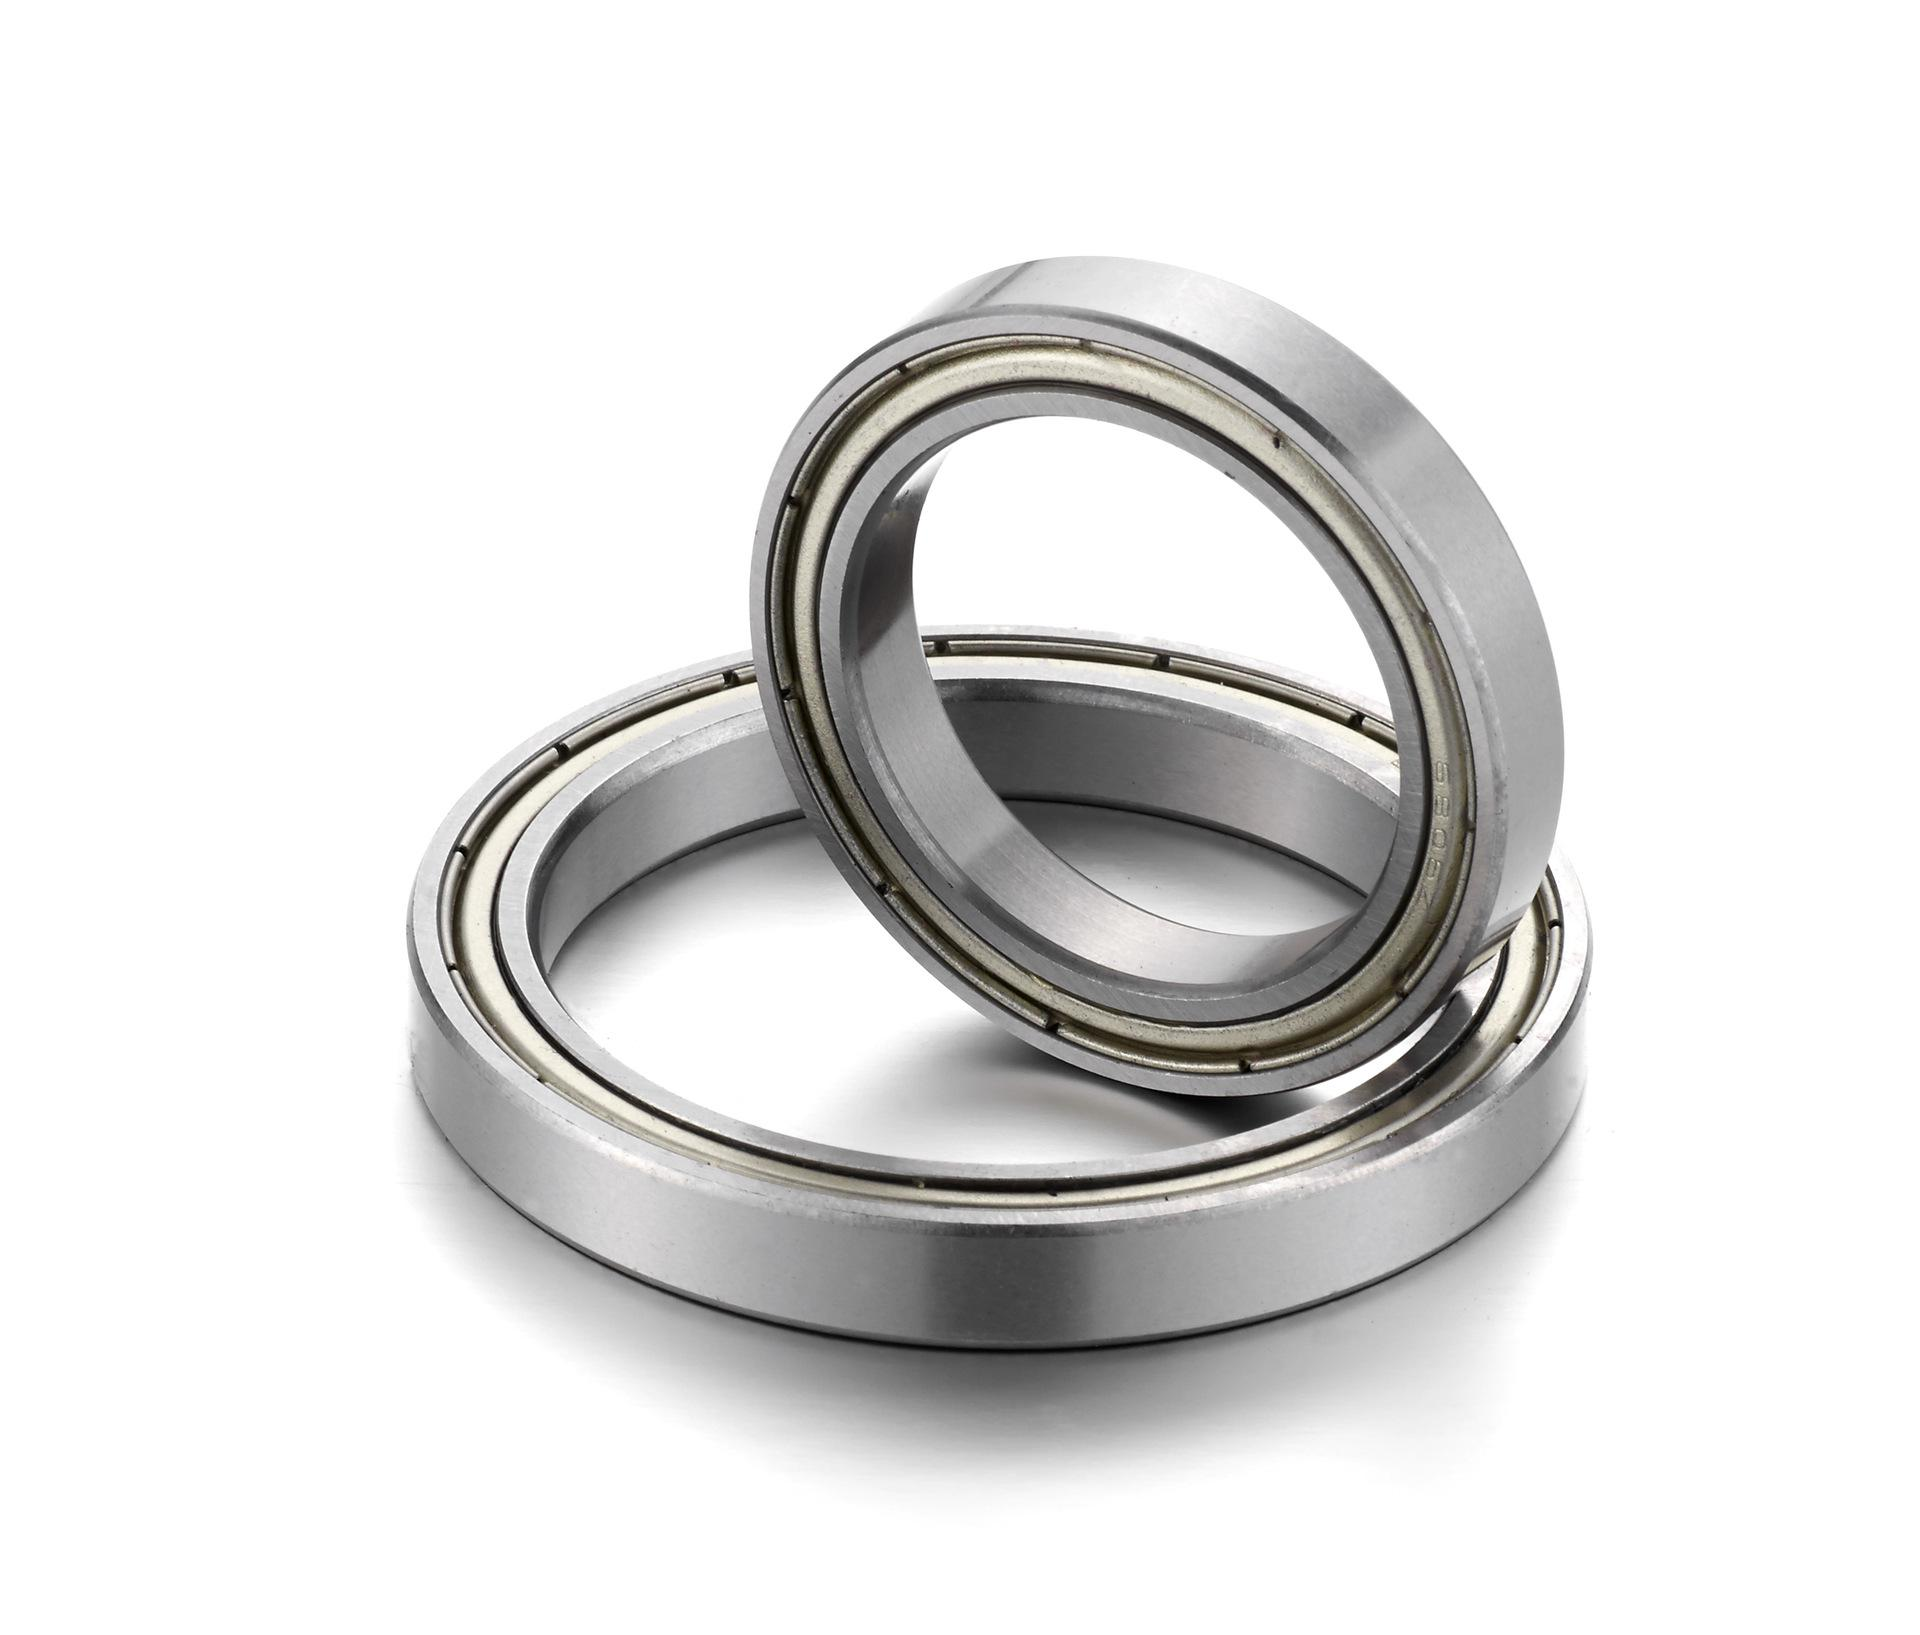 ФОТО S51111 55x78x16mm 55*78*16mm 51111 stainless steel thrust ball bearing